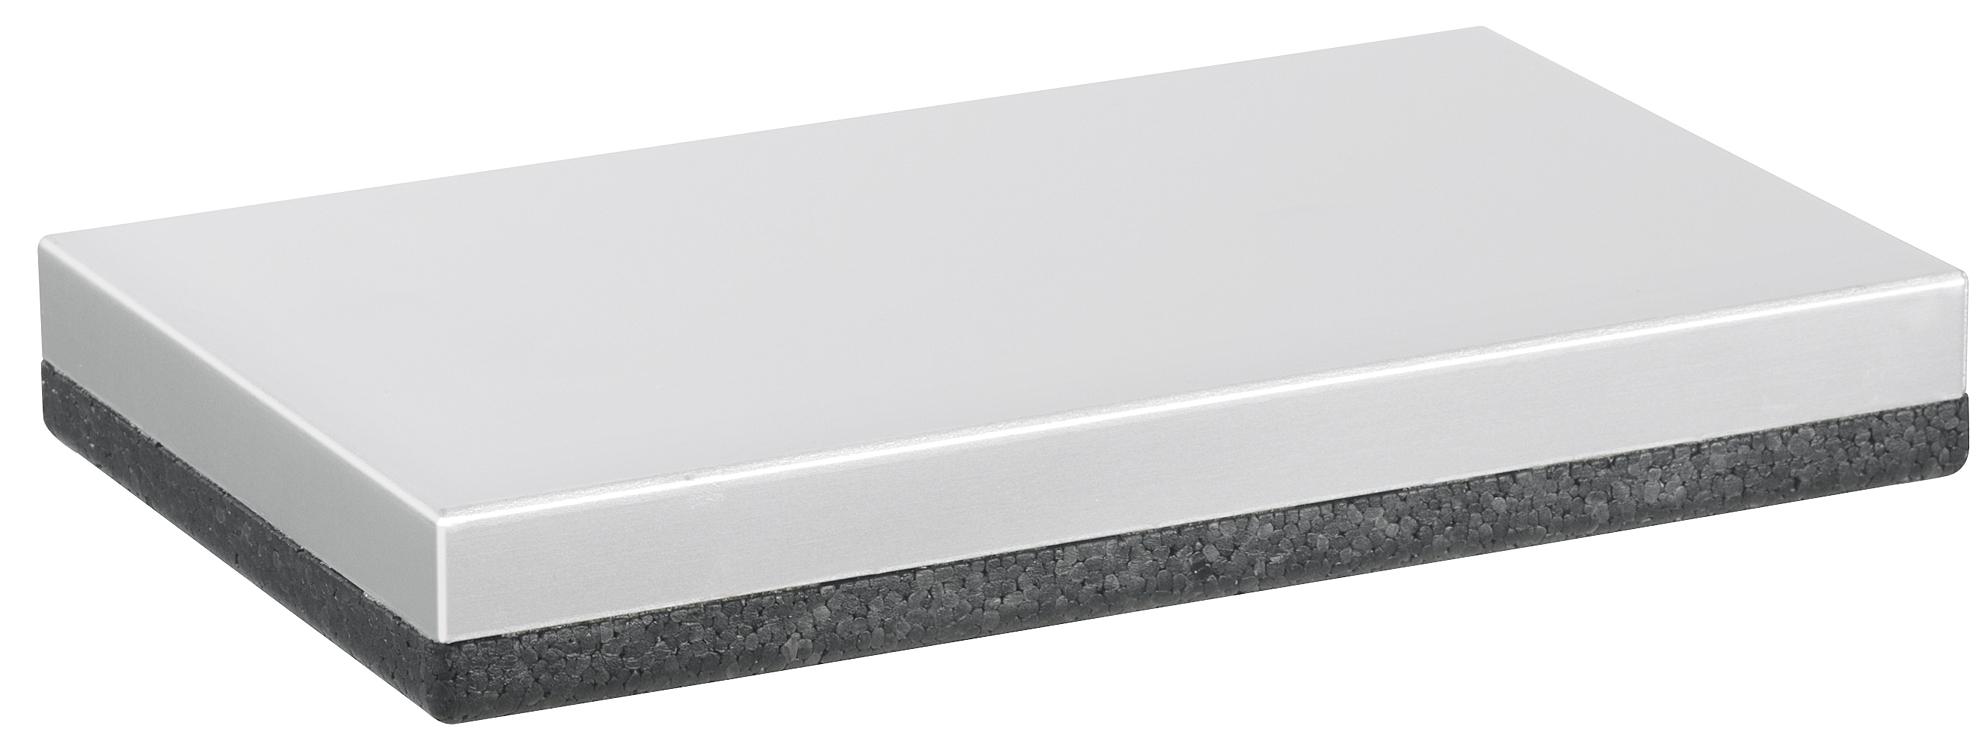 Icetainer Kylbricka 26cm x 16cm